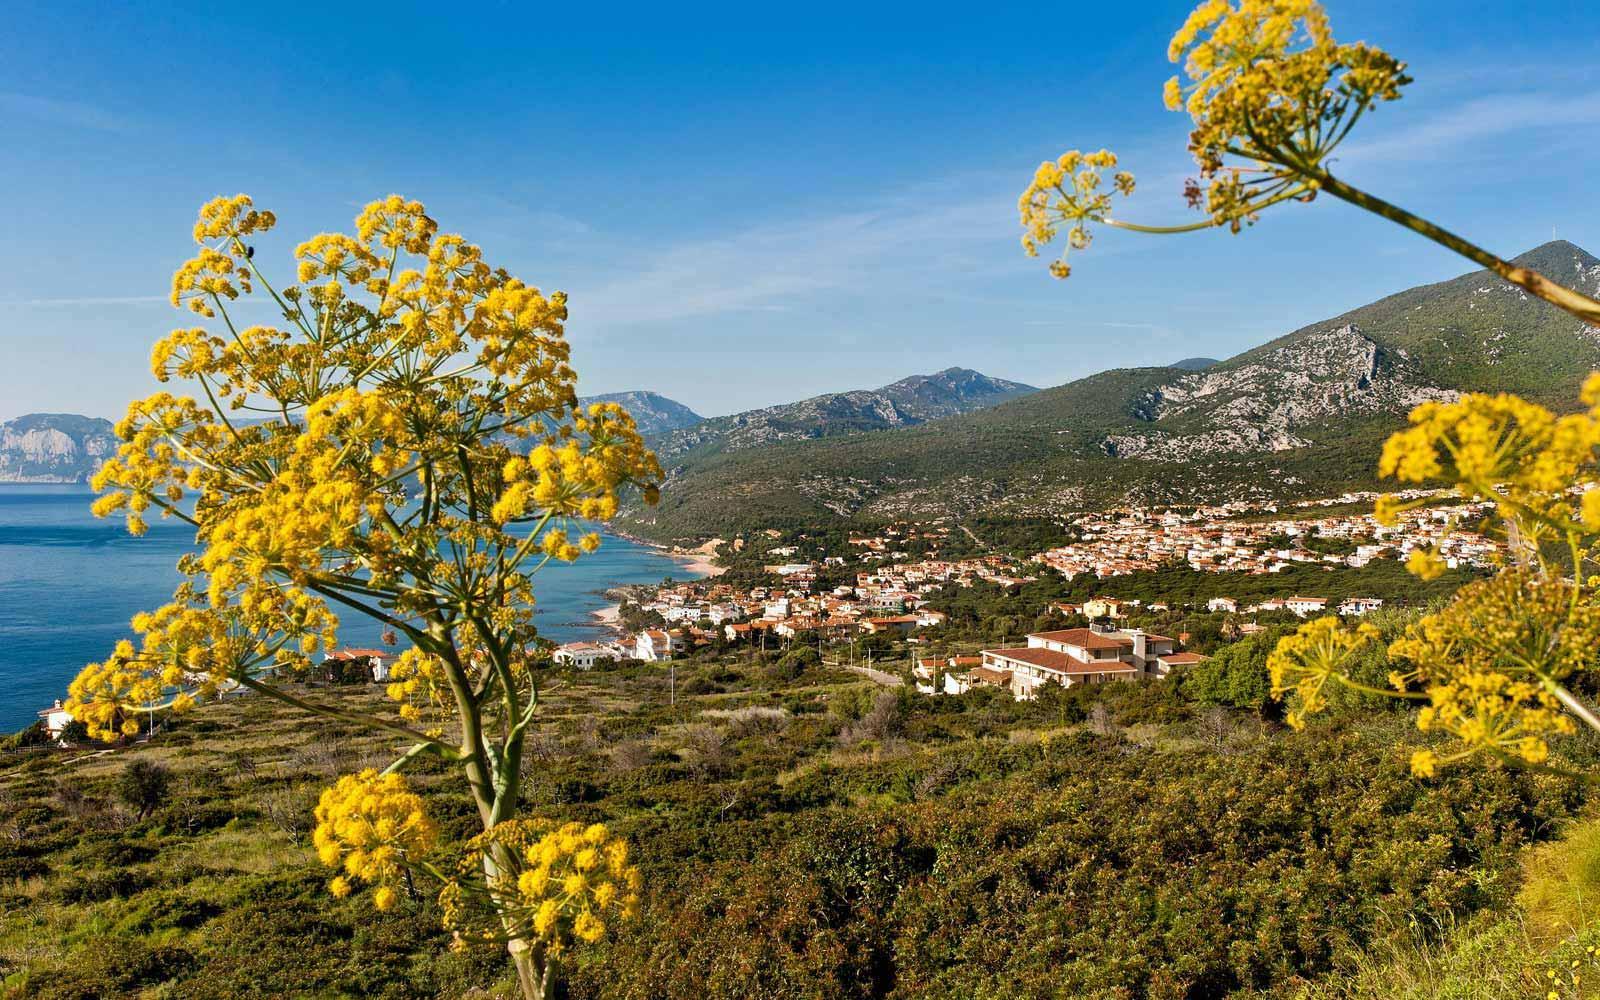 Cala Gonone town